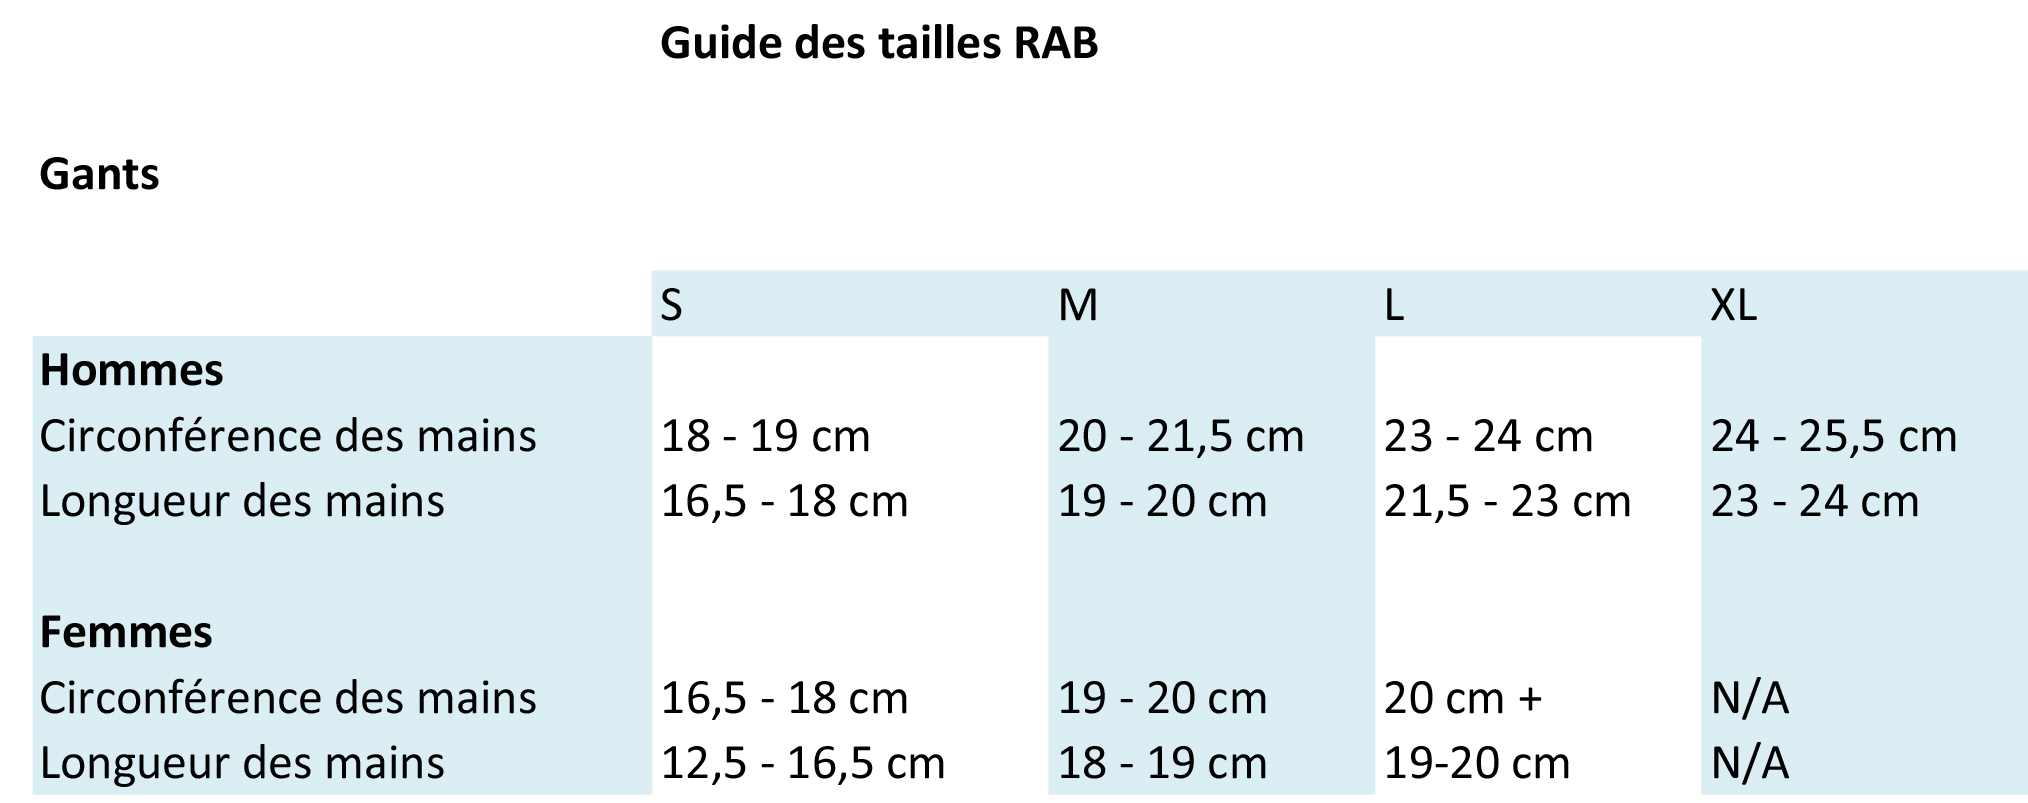 Taille des gants Rab